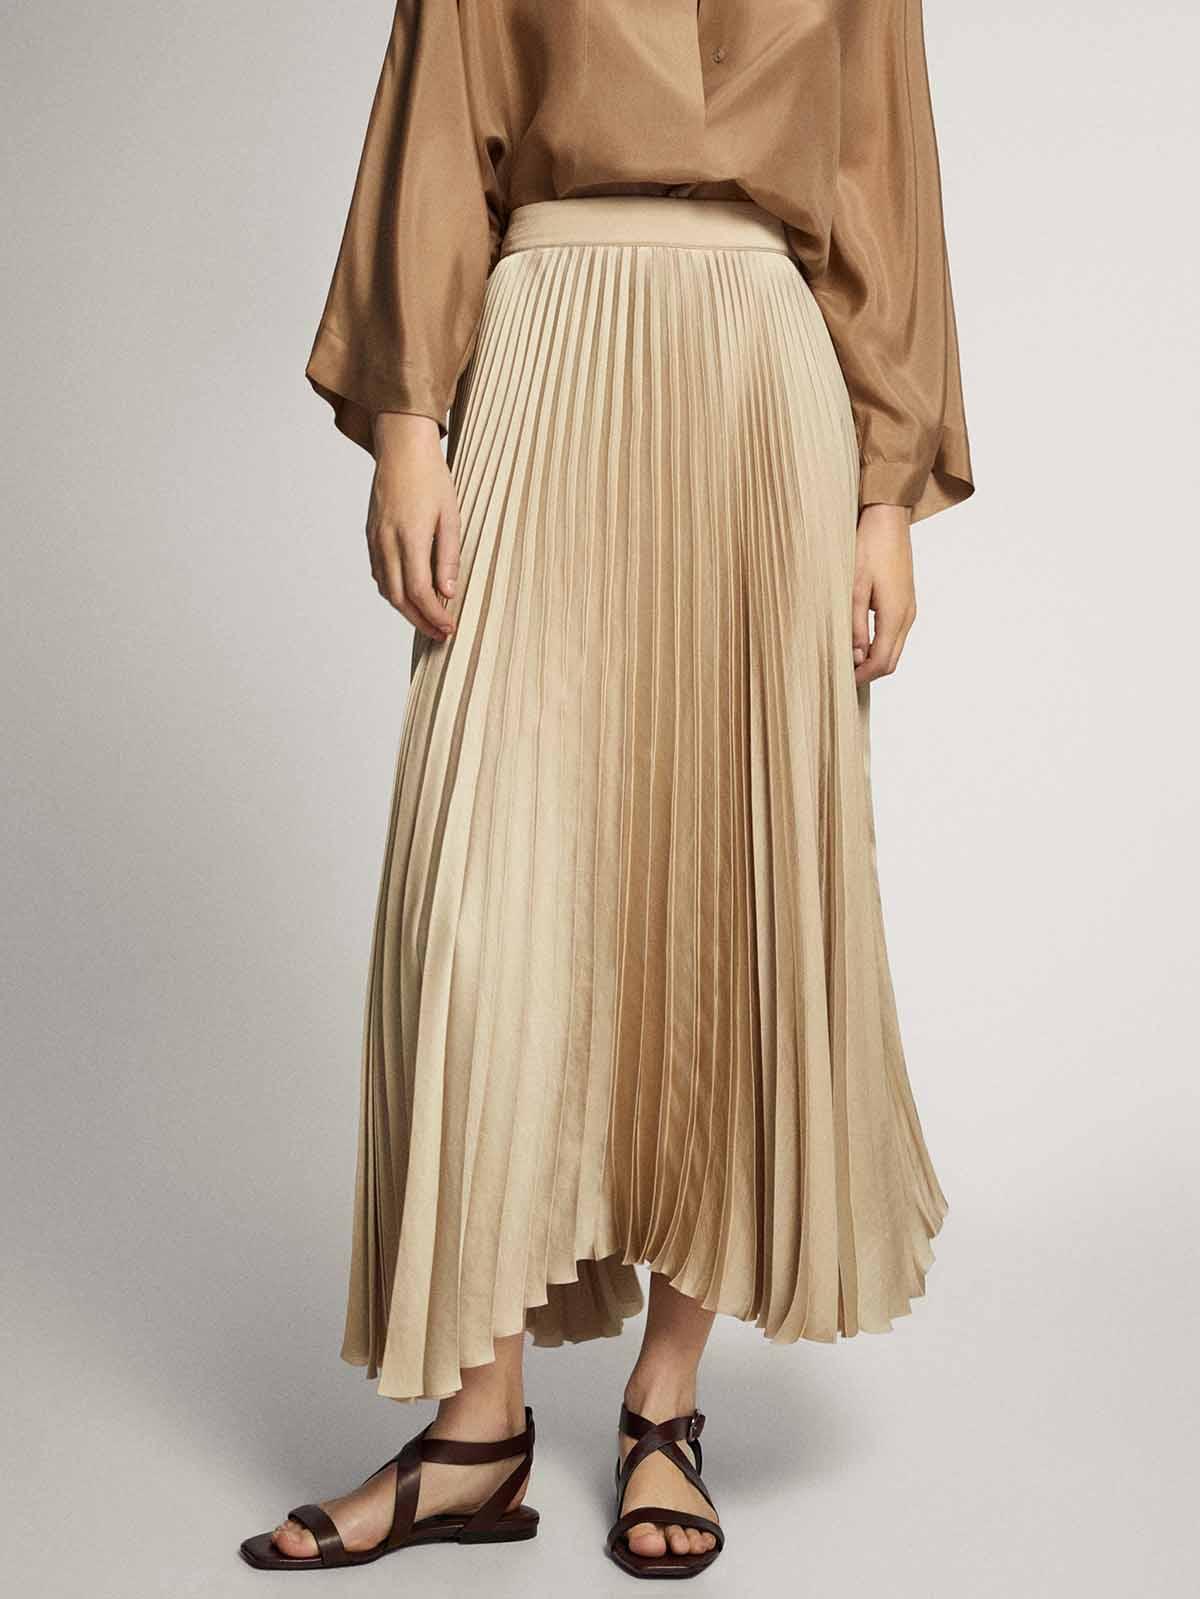 Falda plisada 59,95 euros